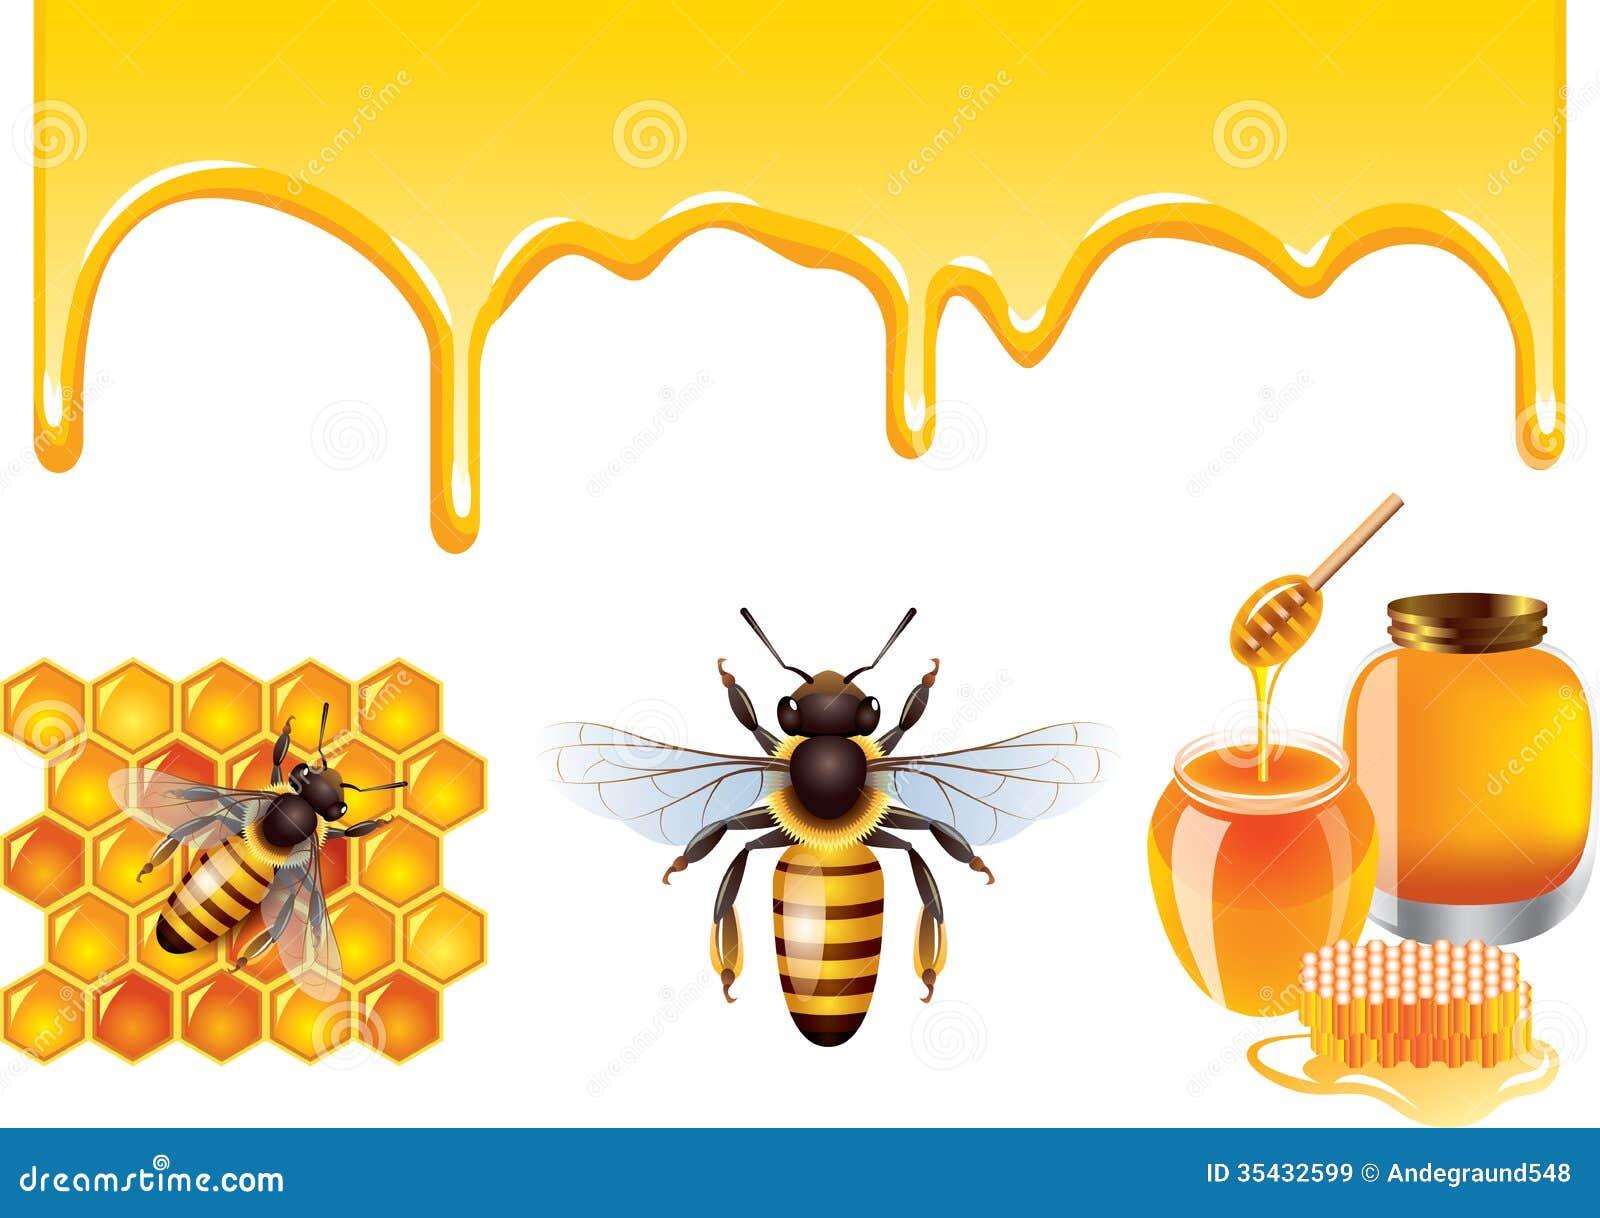 Honey, Bee, Honeycells Vector Set Royalty Free Stock ...